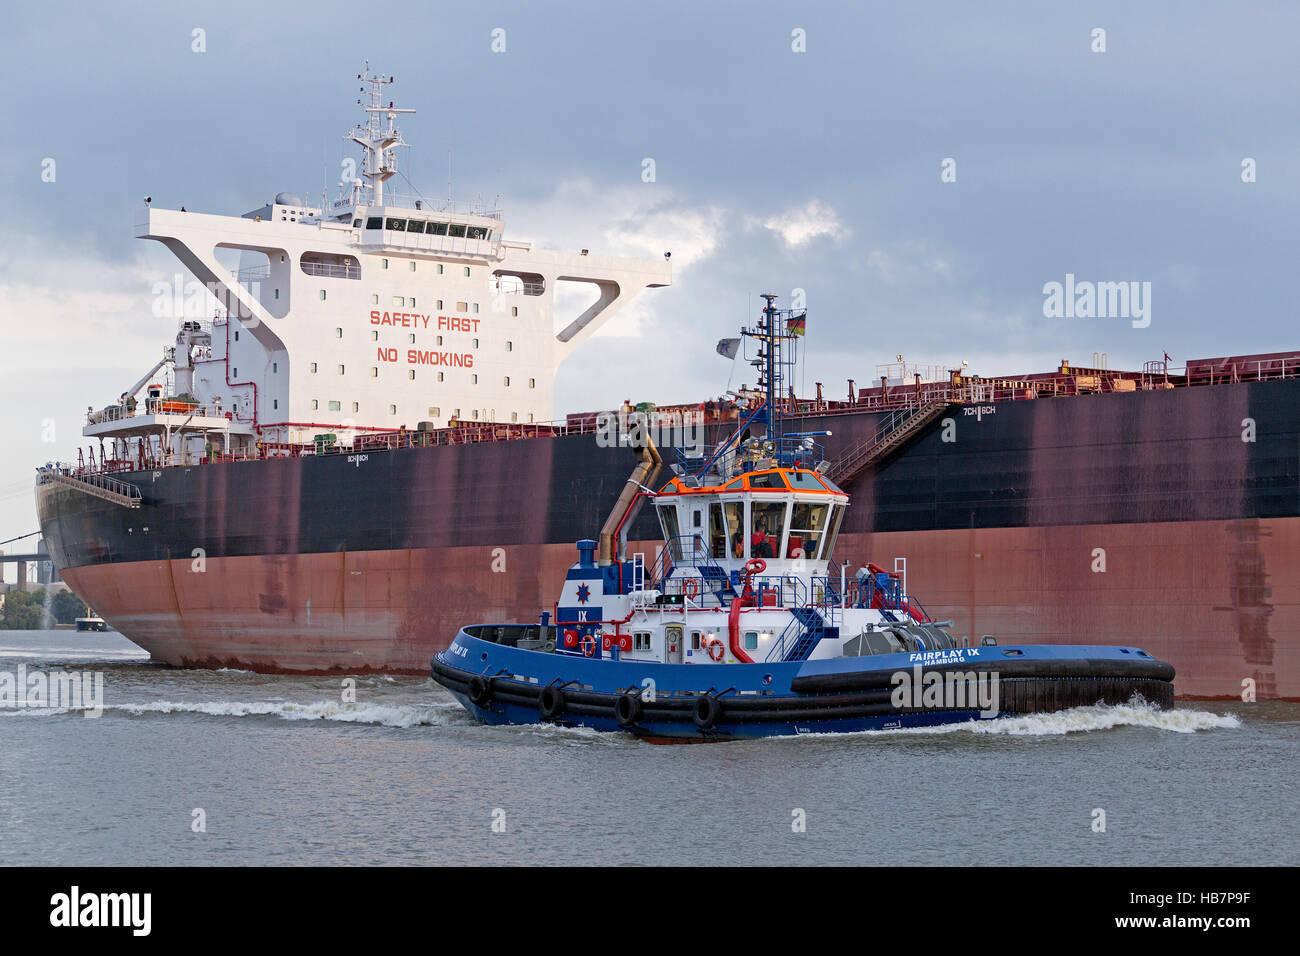 cargo ship and towboat harbour, Hamburg, Germany - Stock Image